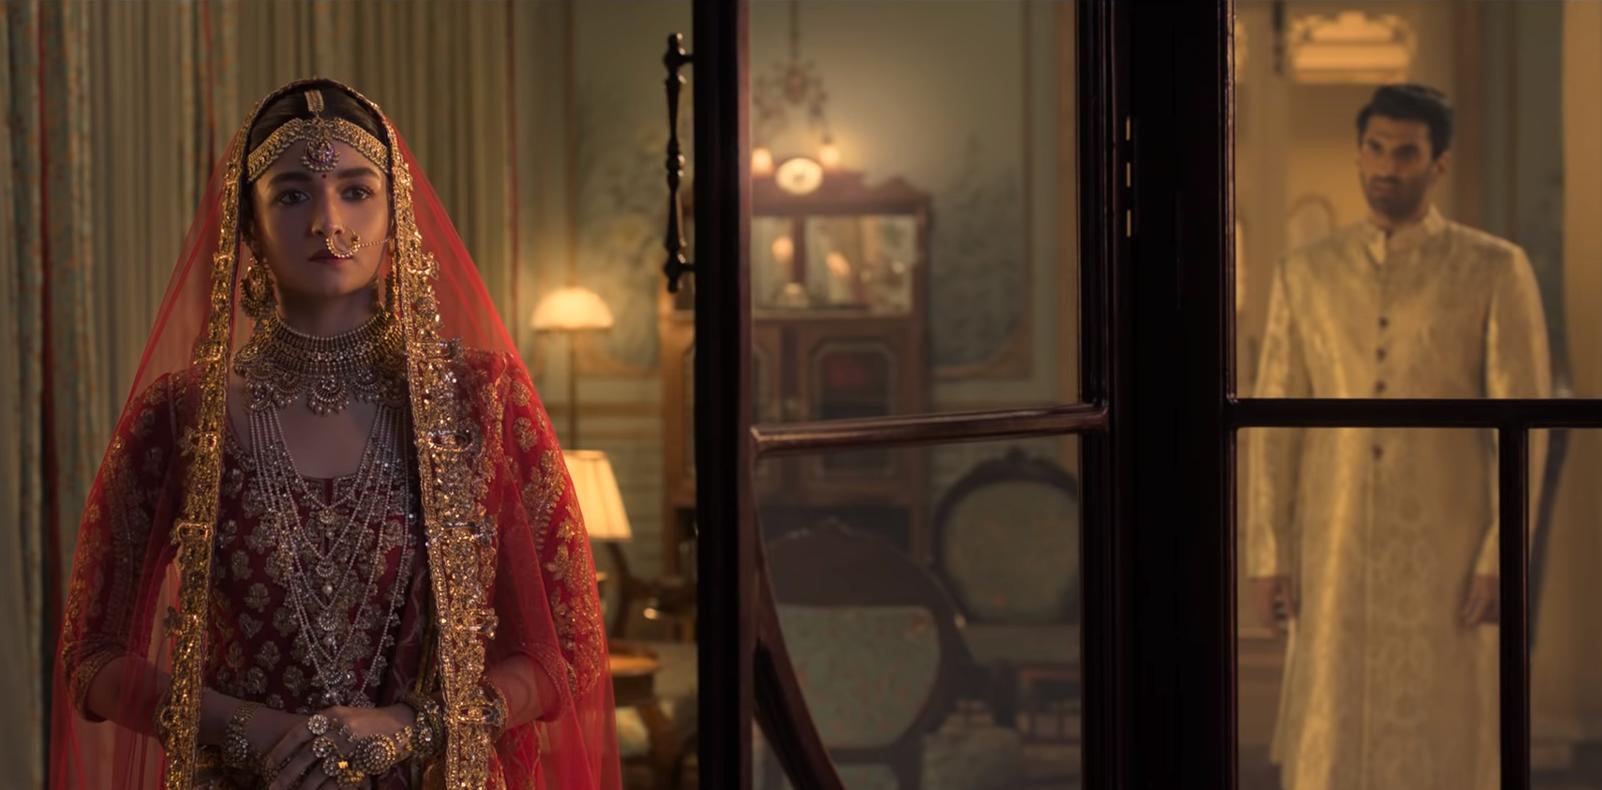 Alia Bhatt: 'My Body Lacks the Grace of a Typical Heroine'